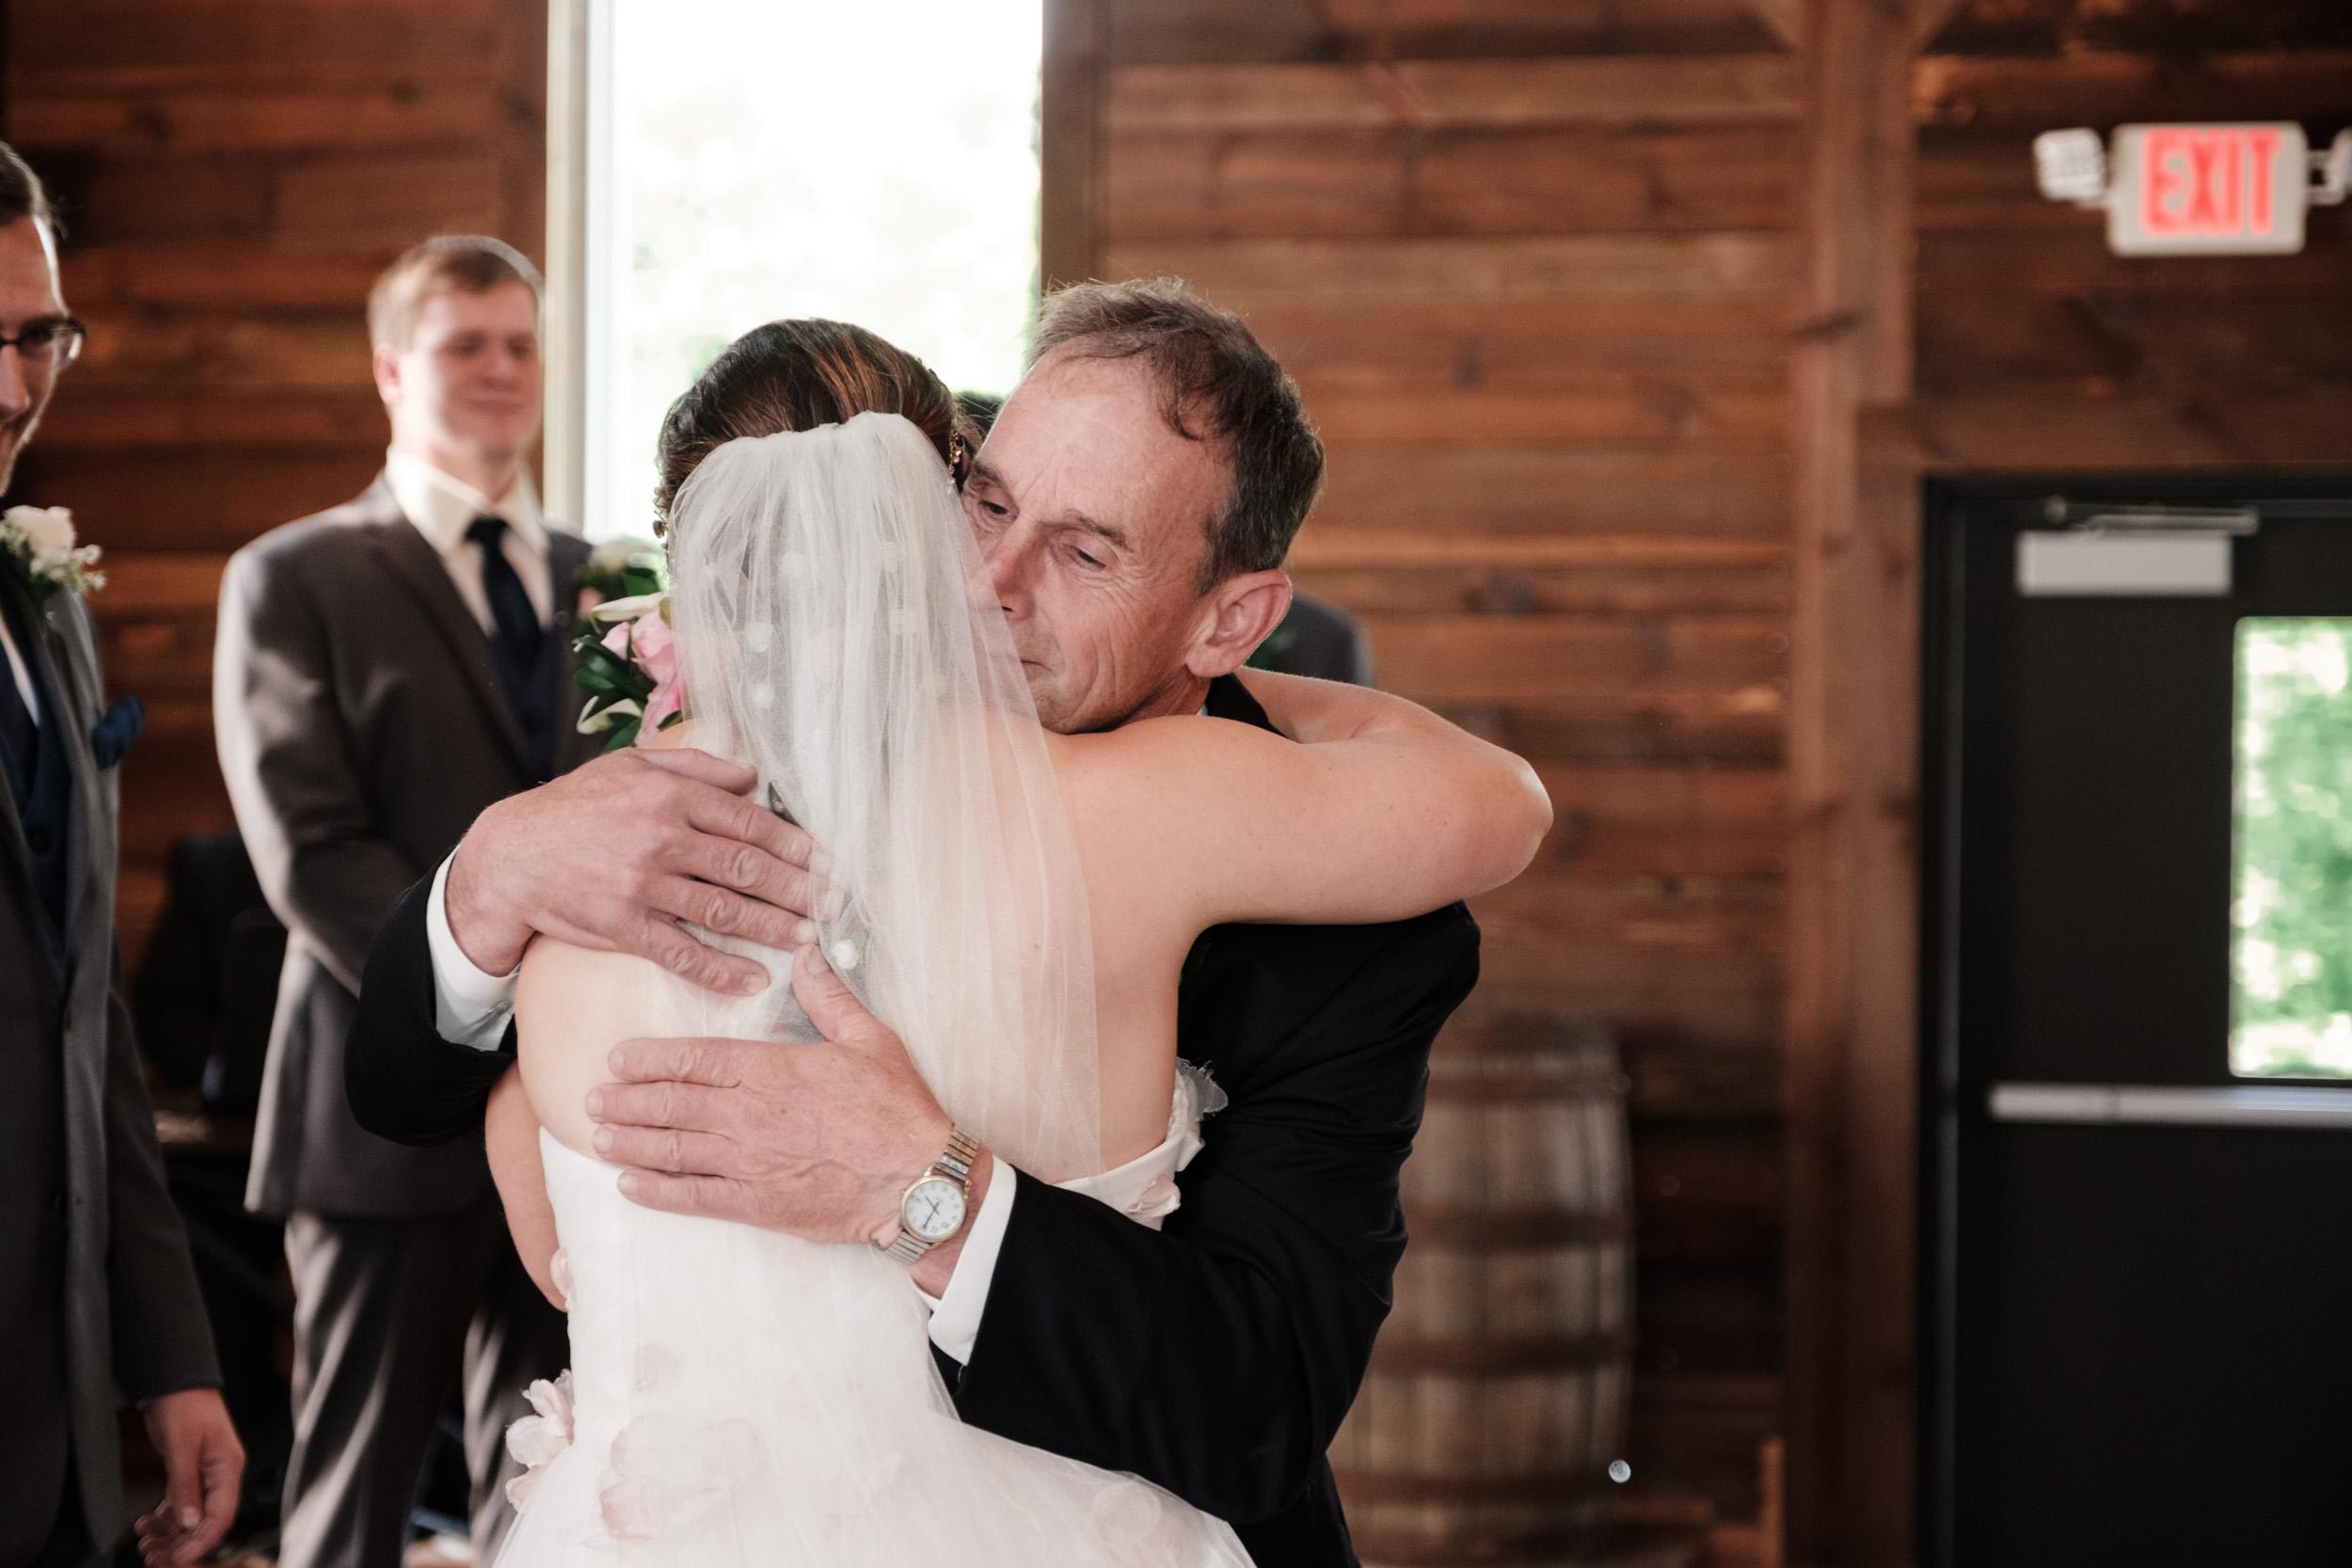 19-06-22-Ryan-Katie-The-Fields-Reserve-Wedding-22.jpg